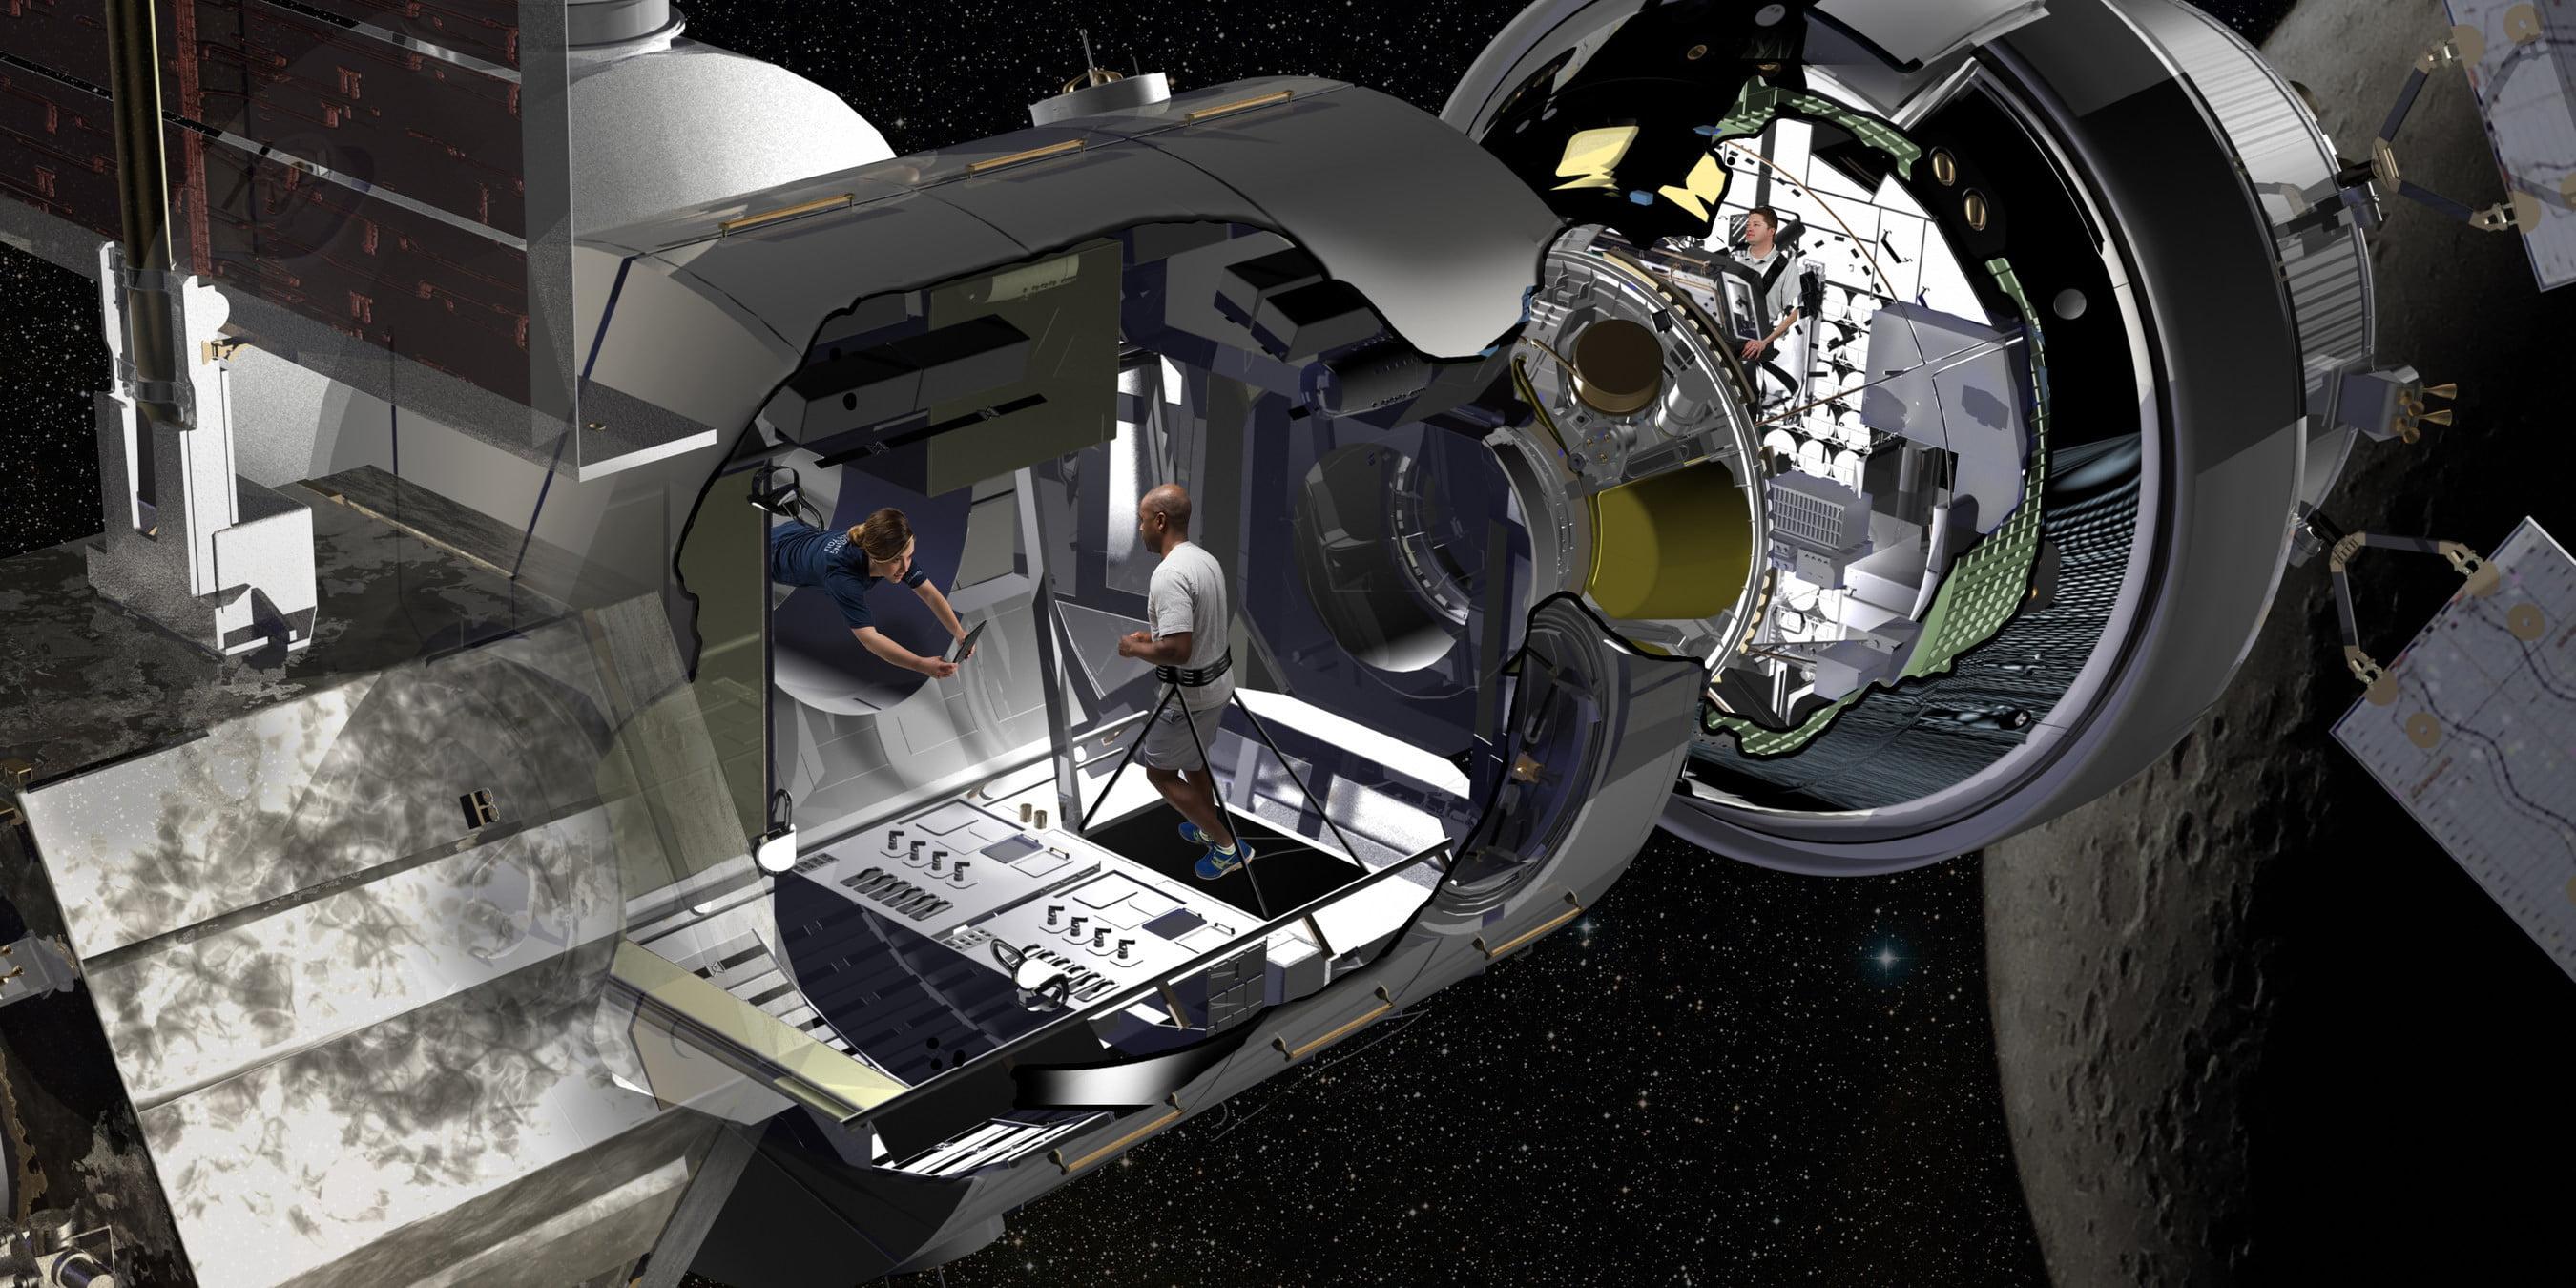 Space shuttle junk gives shape to Lockheed Martin's new habitat prototype